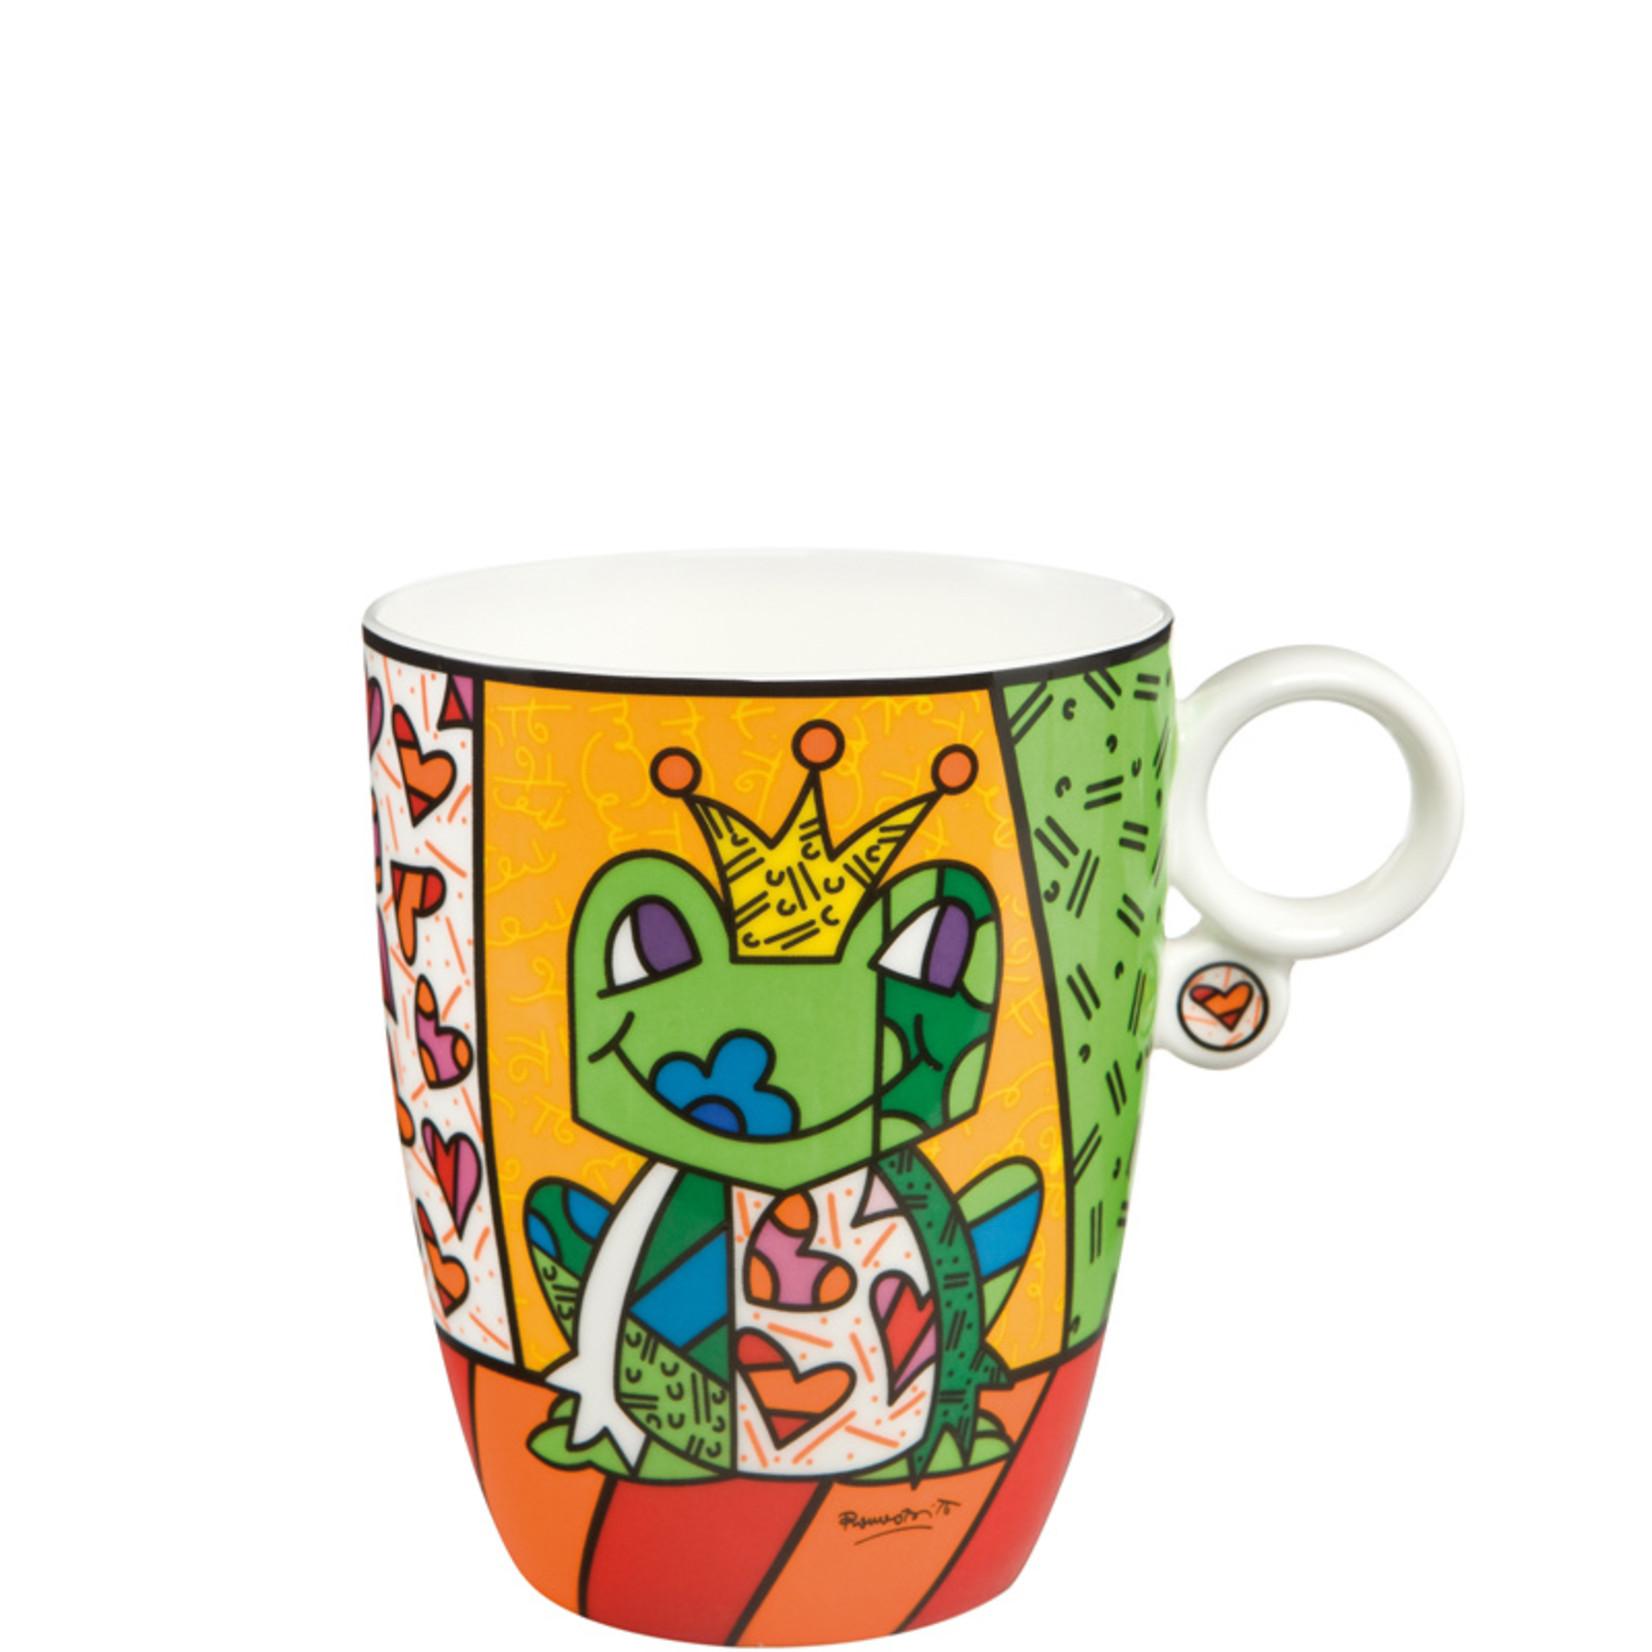 Goebel Porzellanmanufaktur Kaffeebecher Prince   Romero Britto   Goebel Porzellan